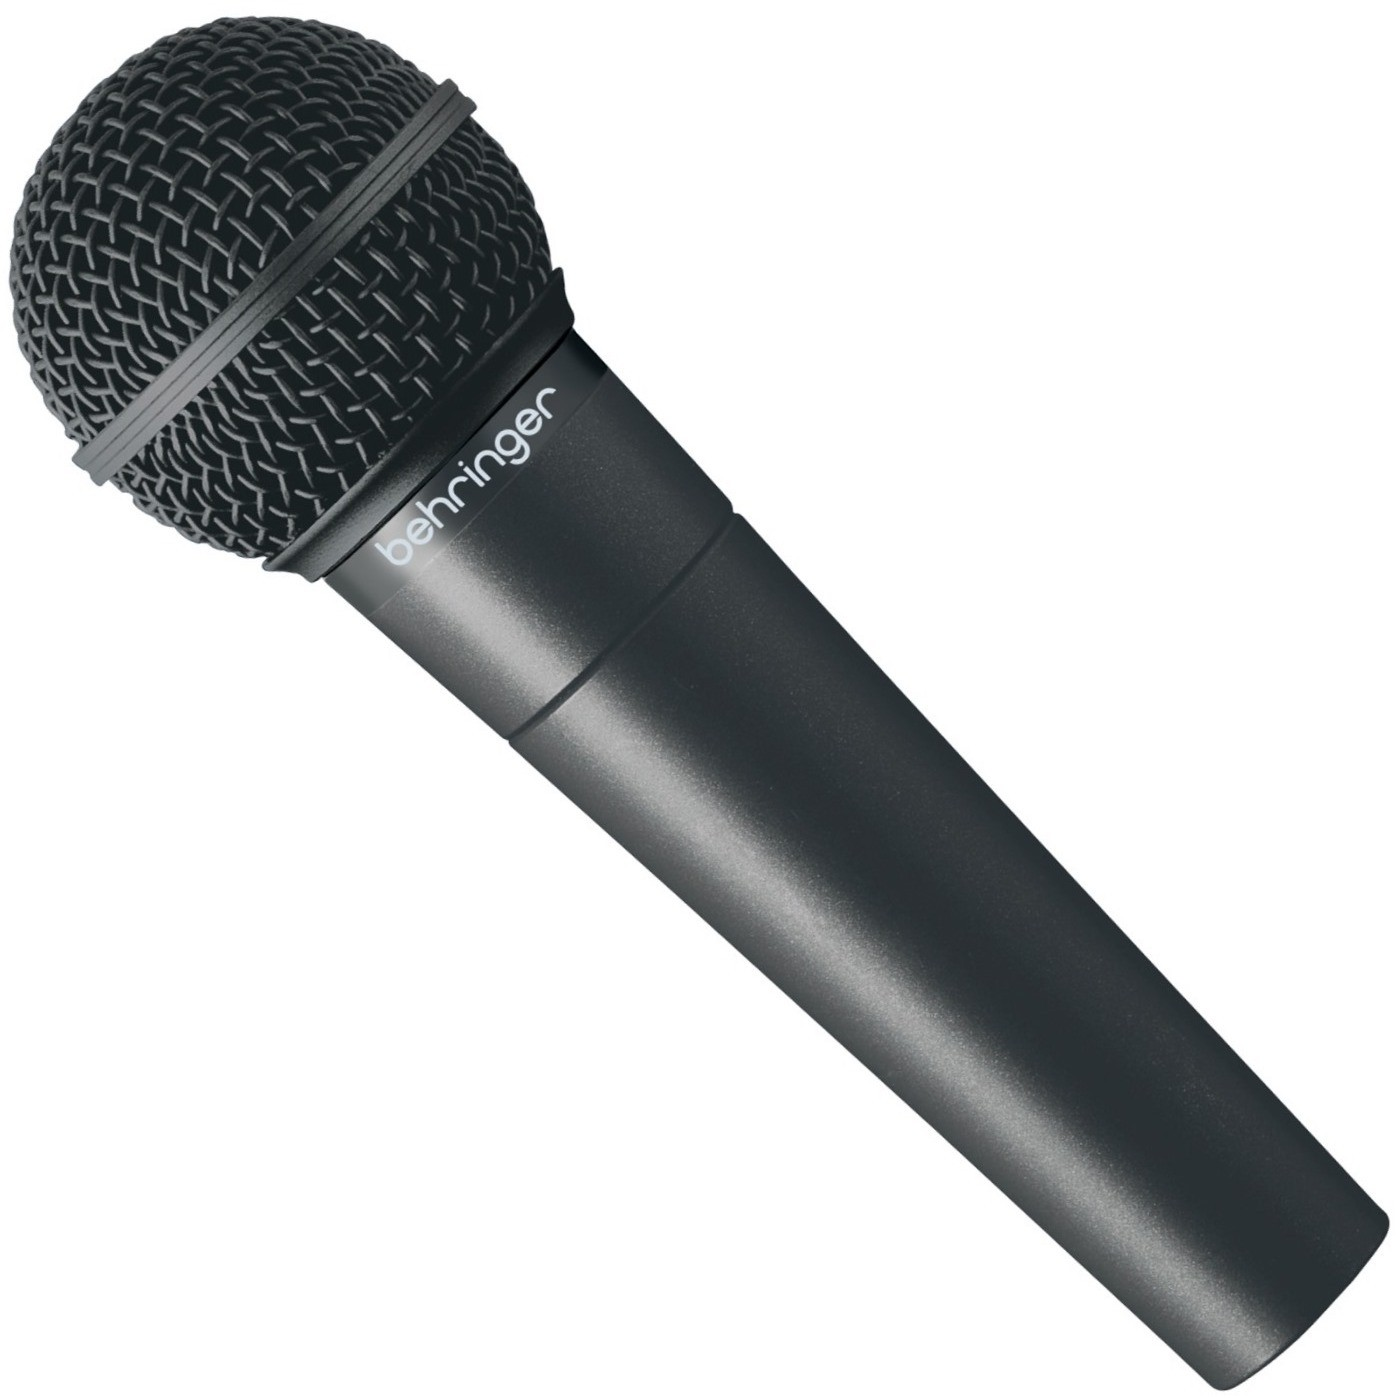 описание микрофона картинки прогулка свежий